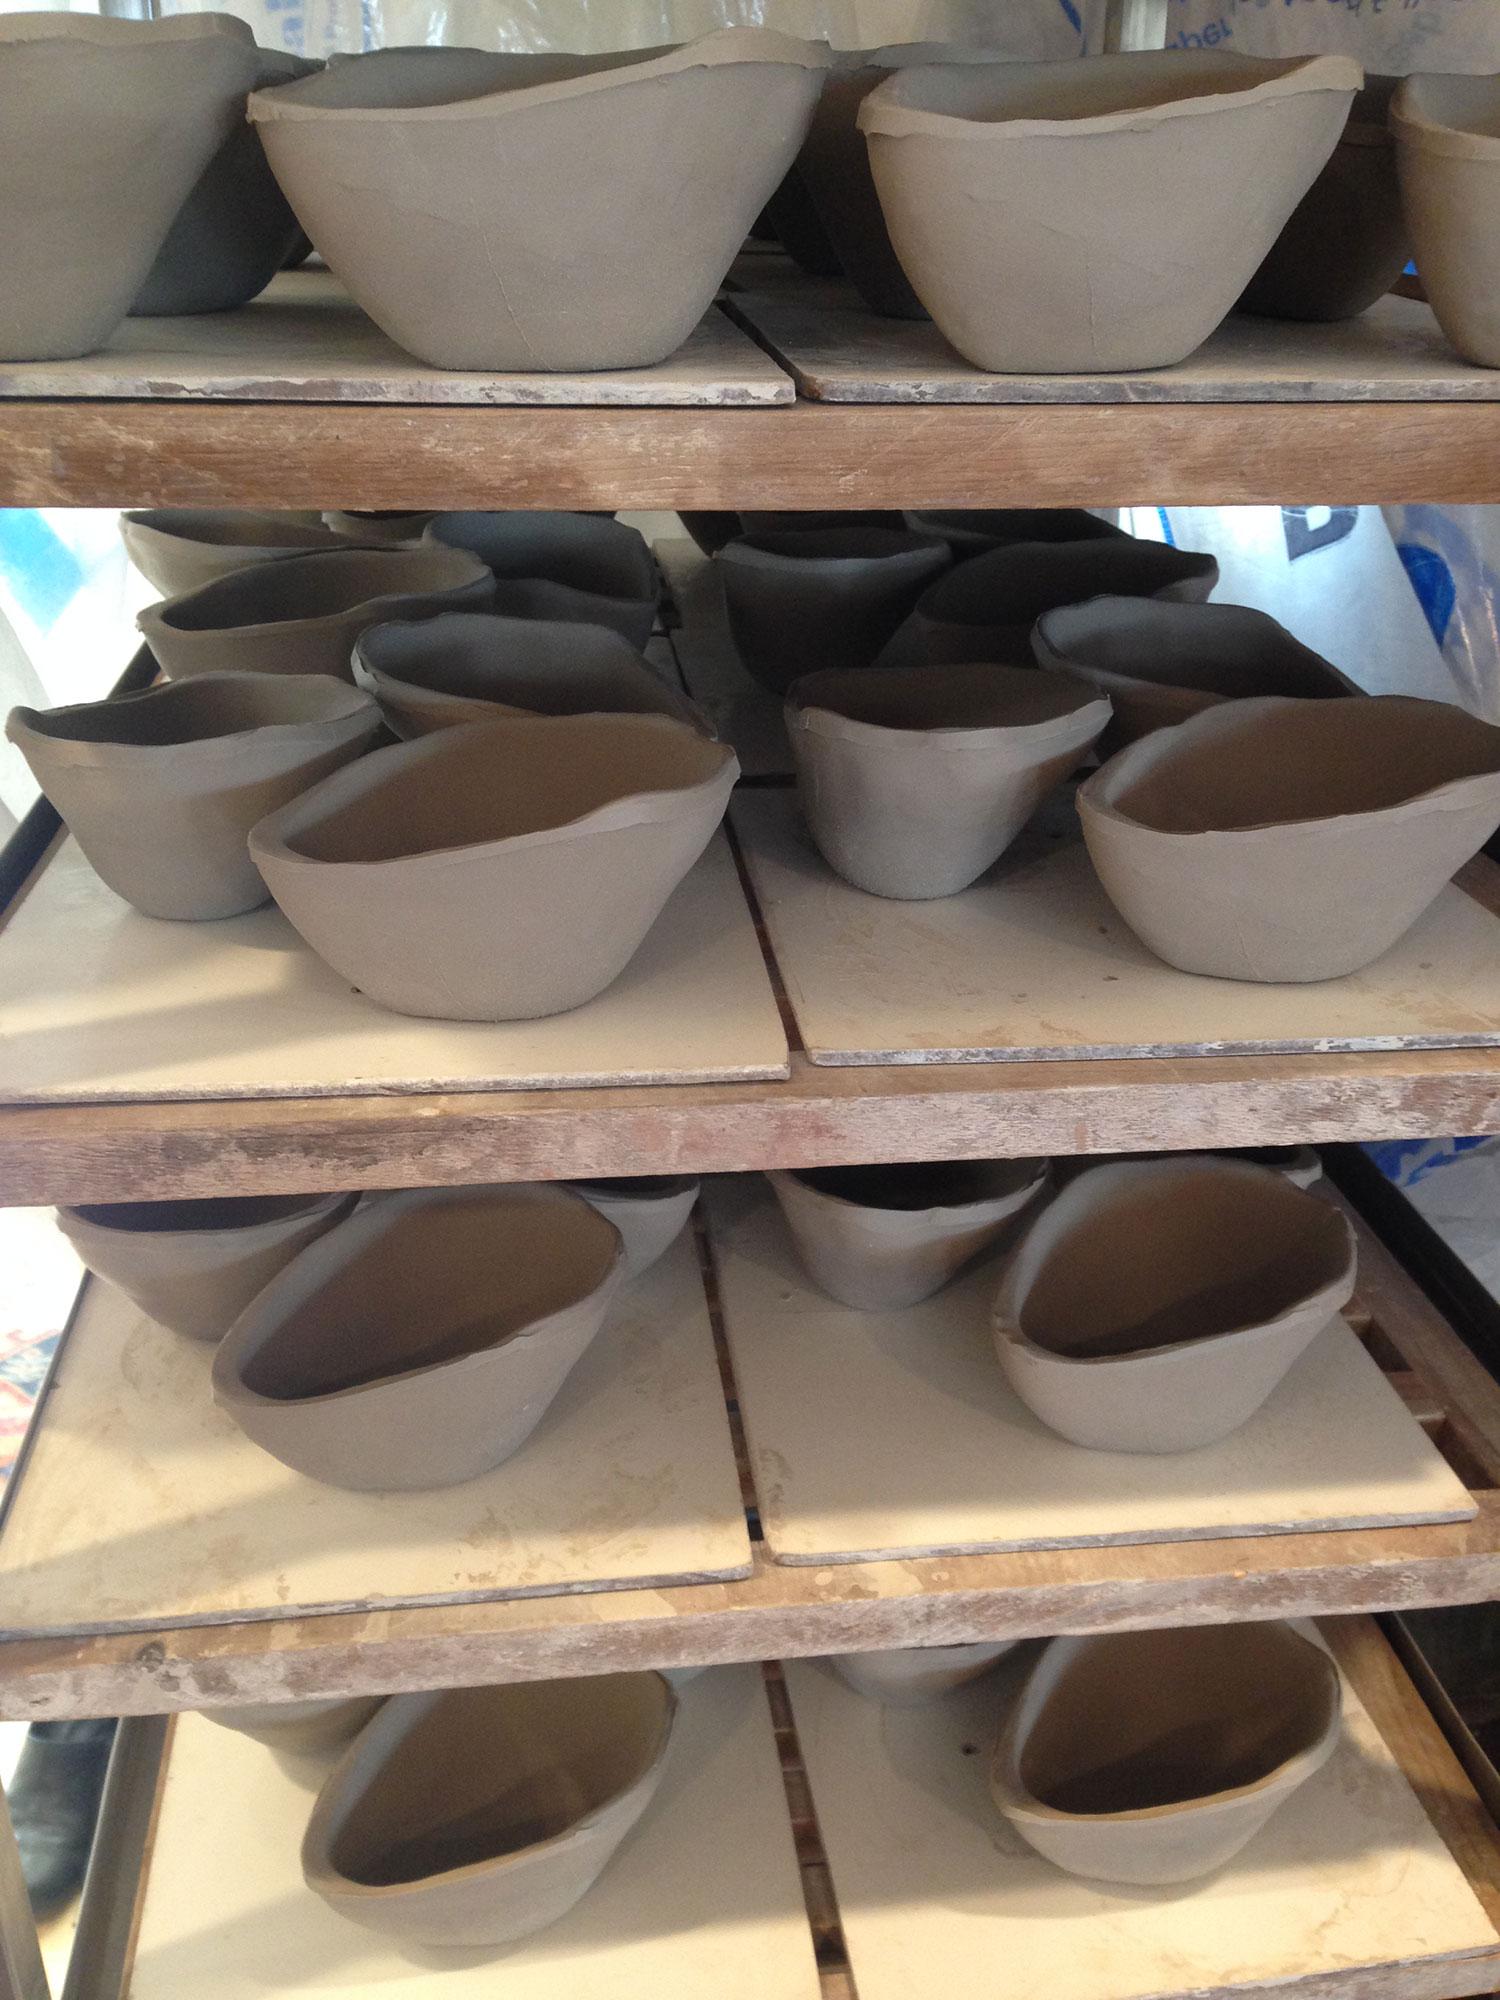 Drying Sauce Bowls